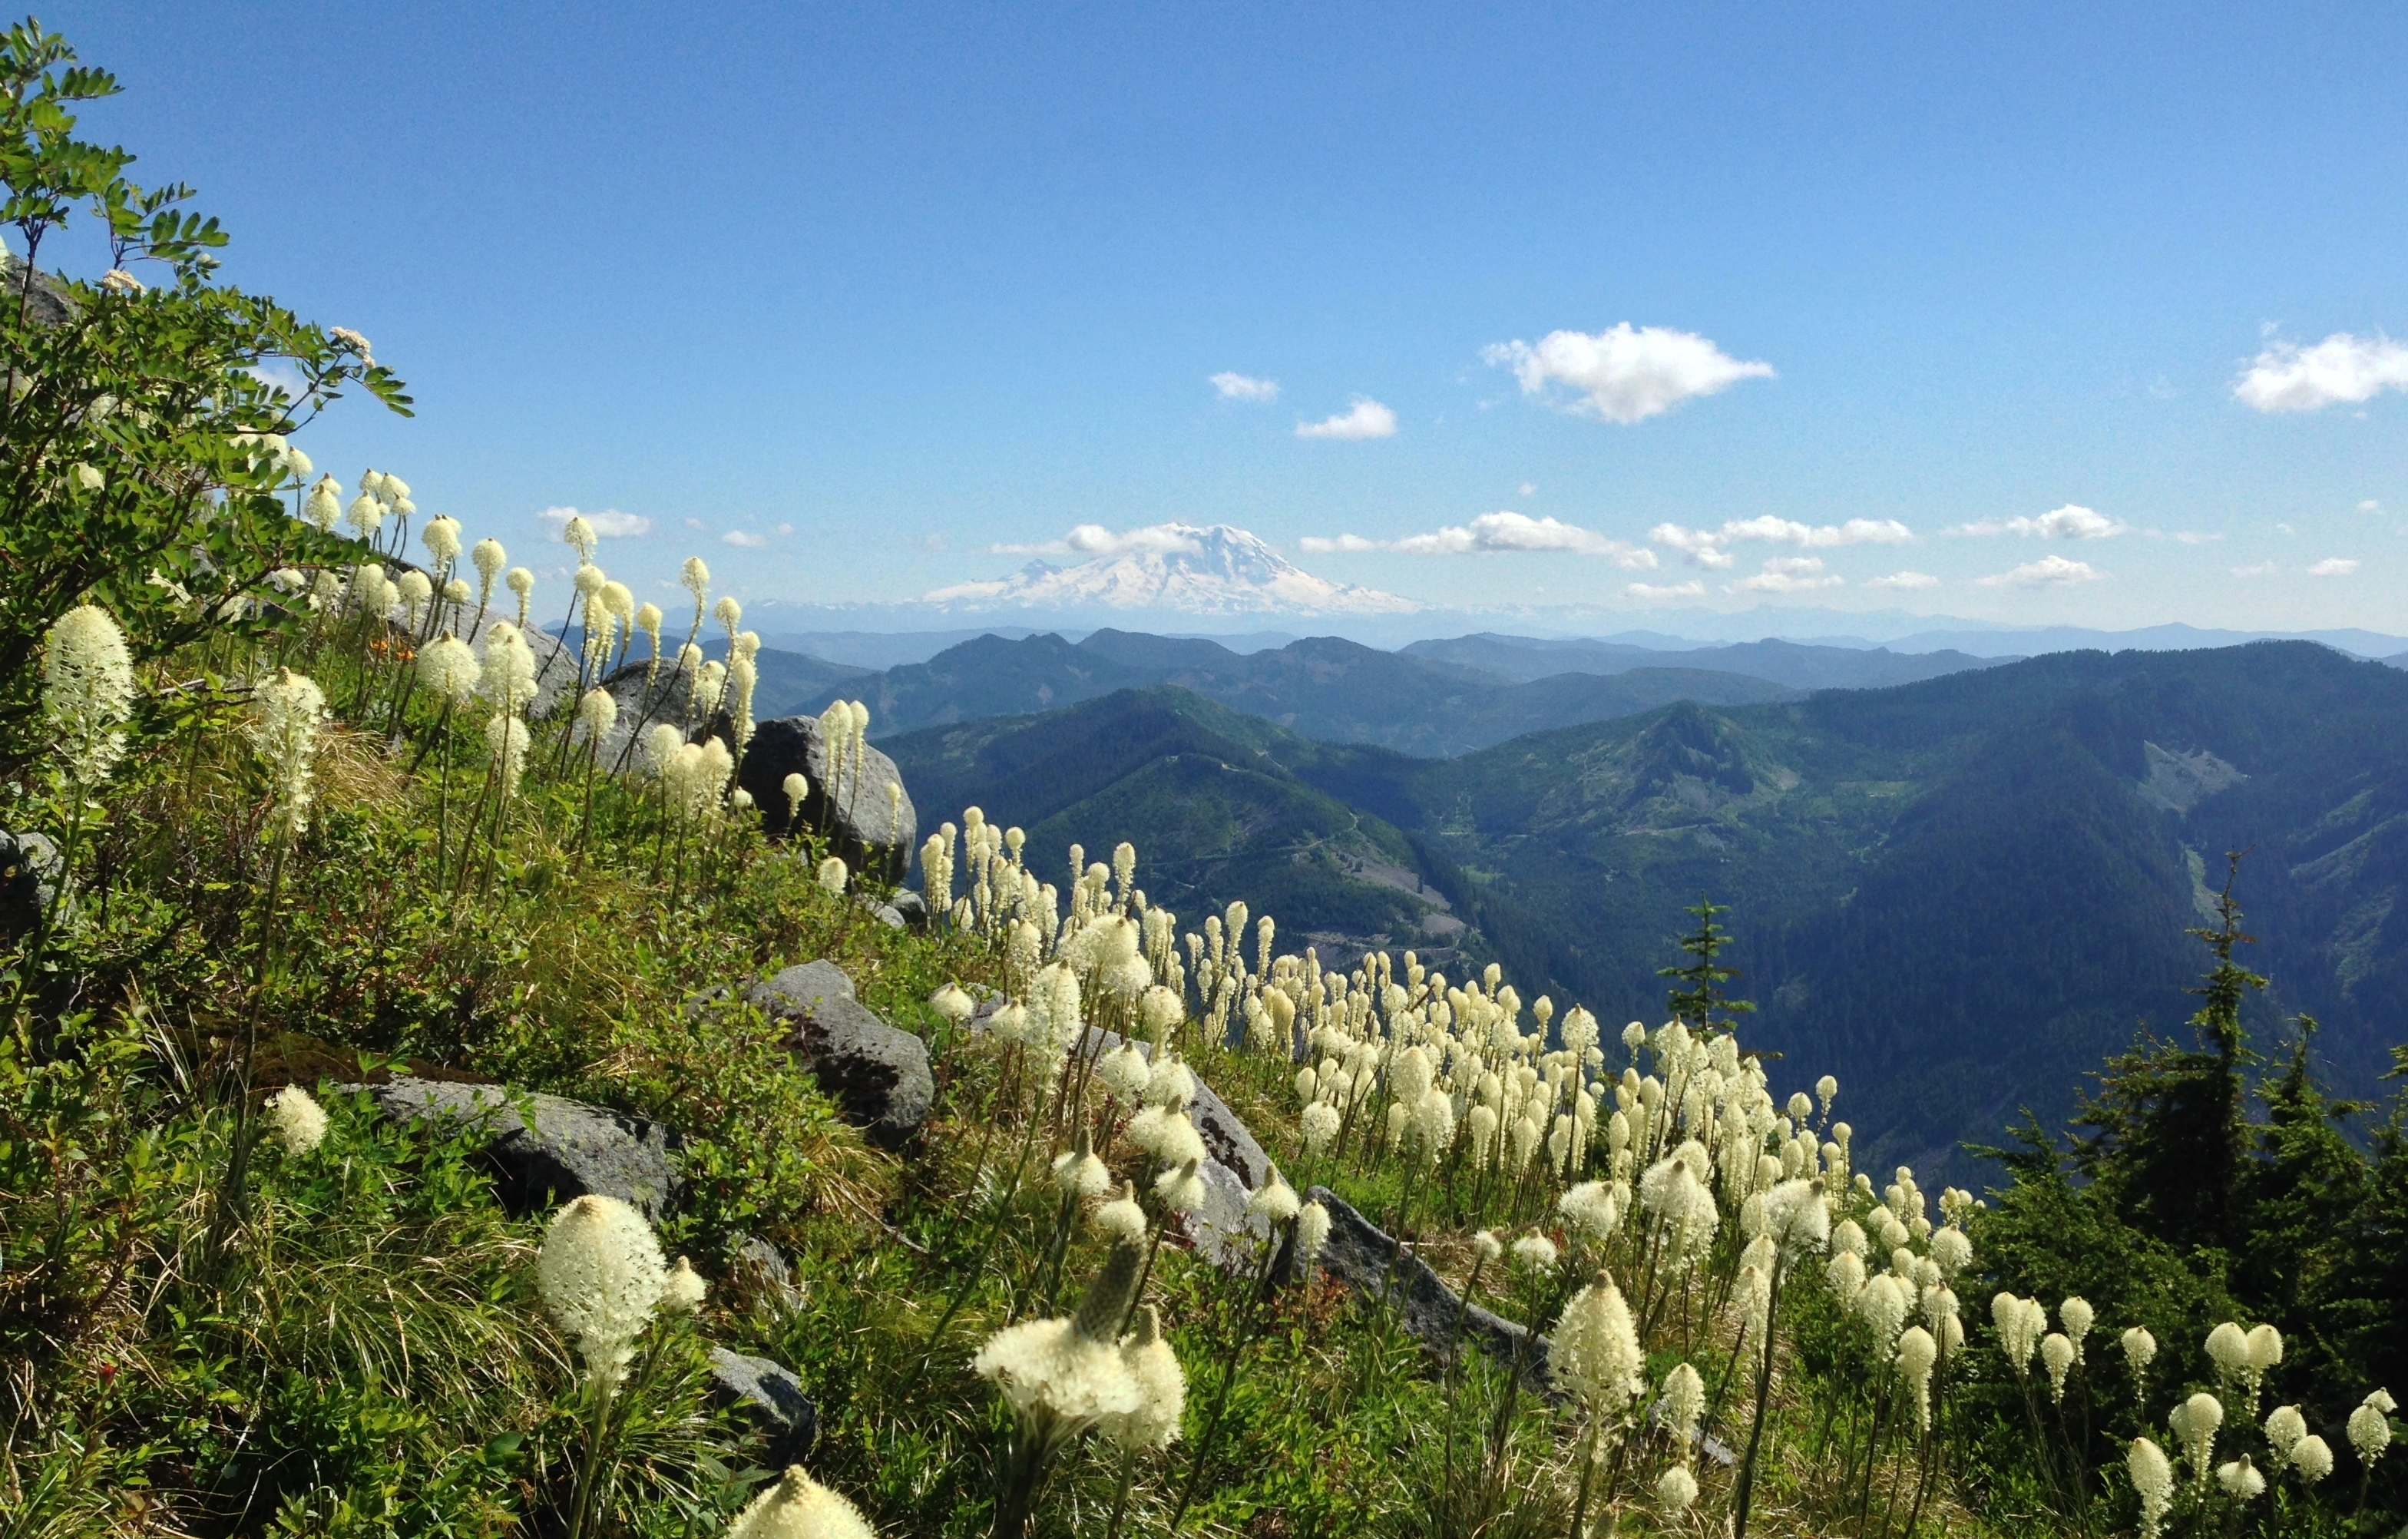 Bandera Mountain's summer blanket of beargrass (Xerophyllum tenax) blooms mimics the snowy slopes of the distant Mt. Rainier. Bandera Mountain Trail, July 09, 2014.